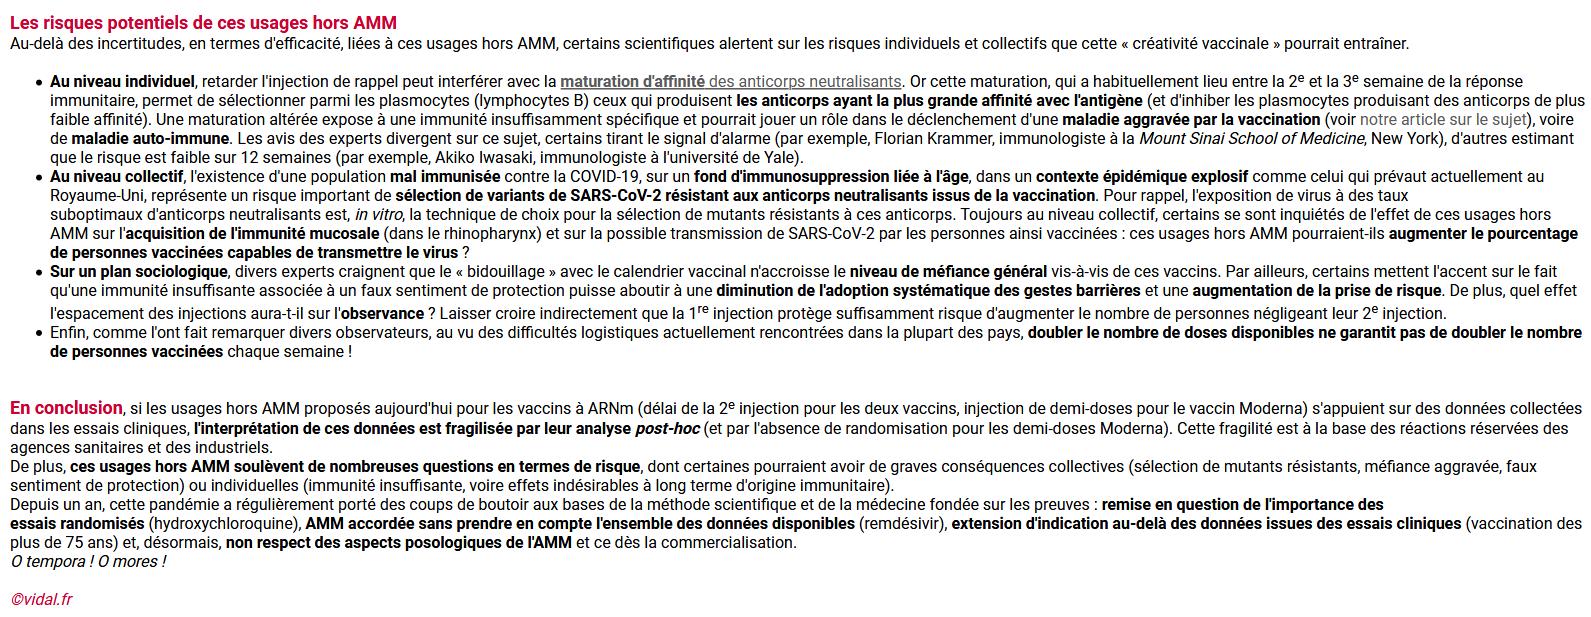 Screenshot_2021-01-08 واکسن COVID19 باعث خلاقیت در برنامه واکسن می شود .png